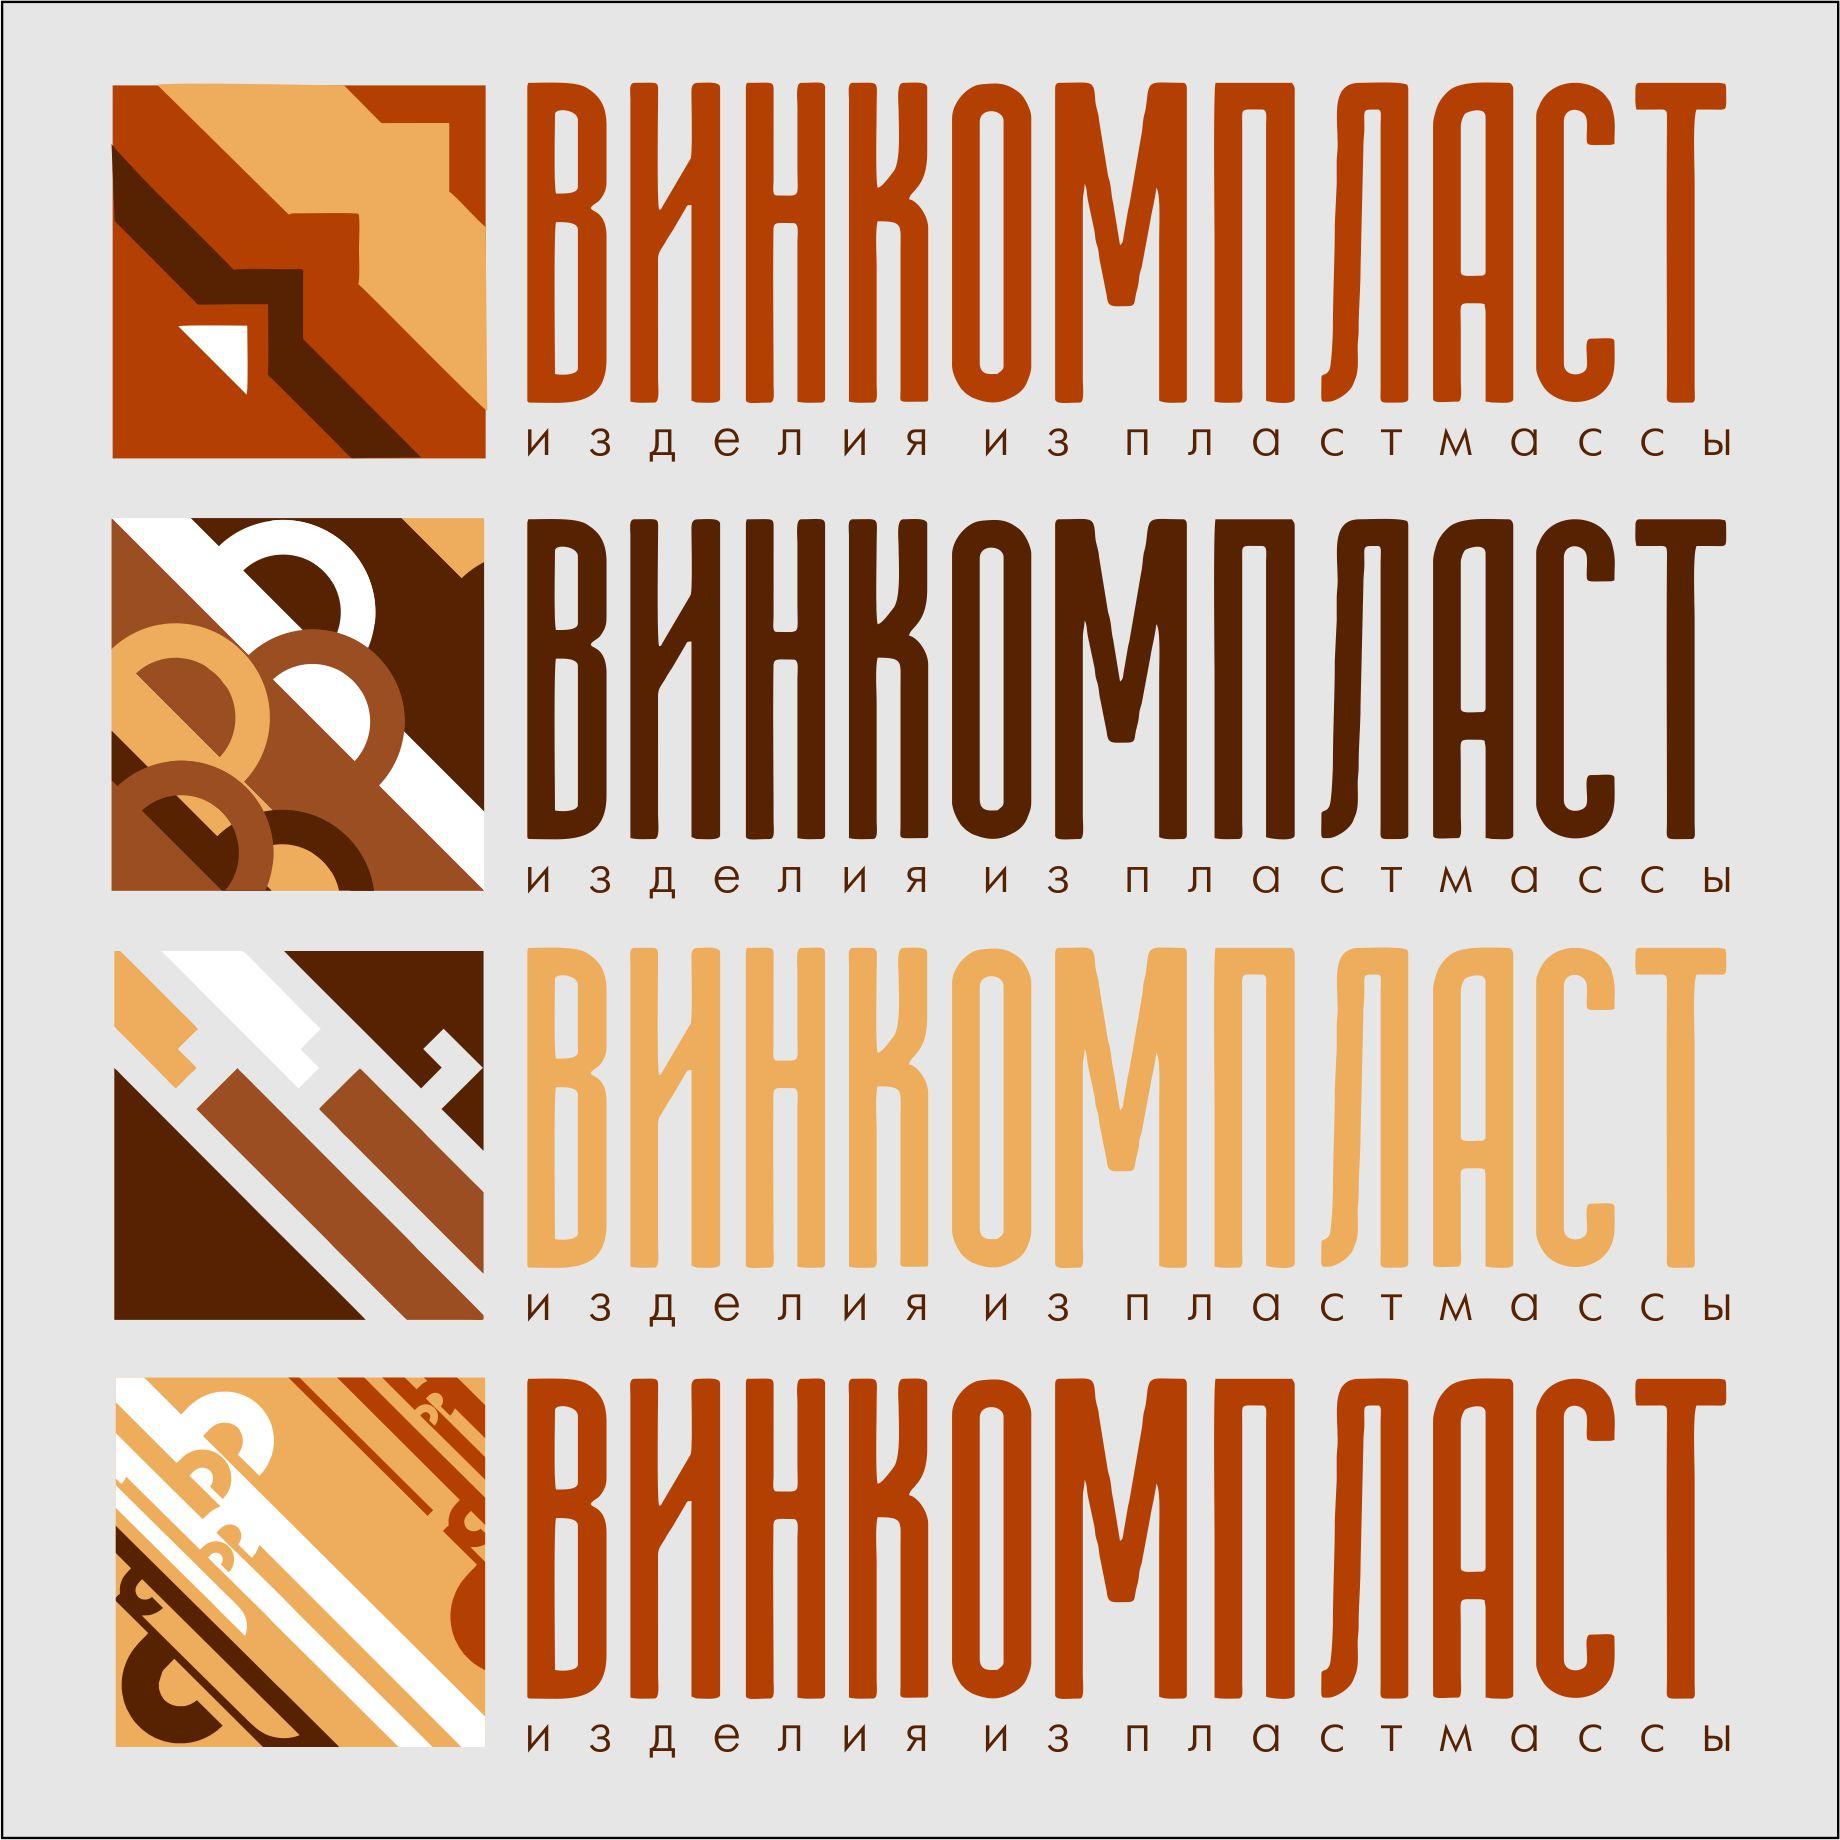 Логотип, фавикон и визитка для компании Винком Пласт  фото f_9565c479bc978351.jpg